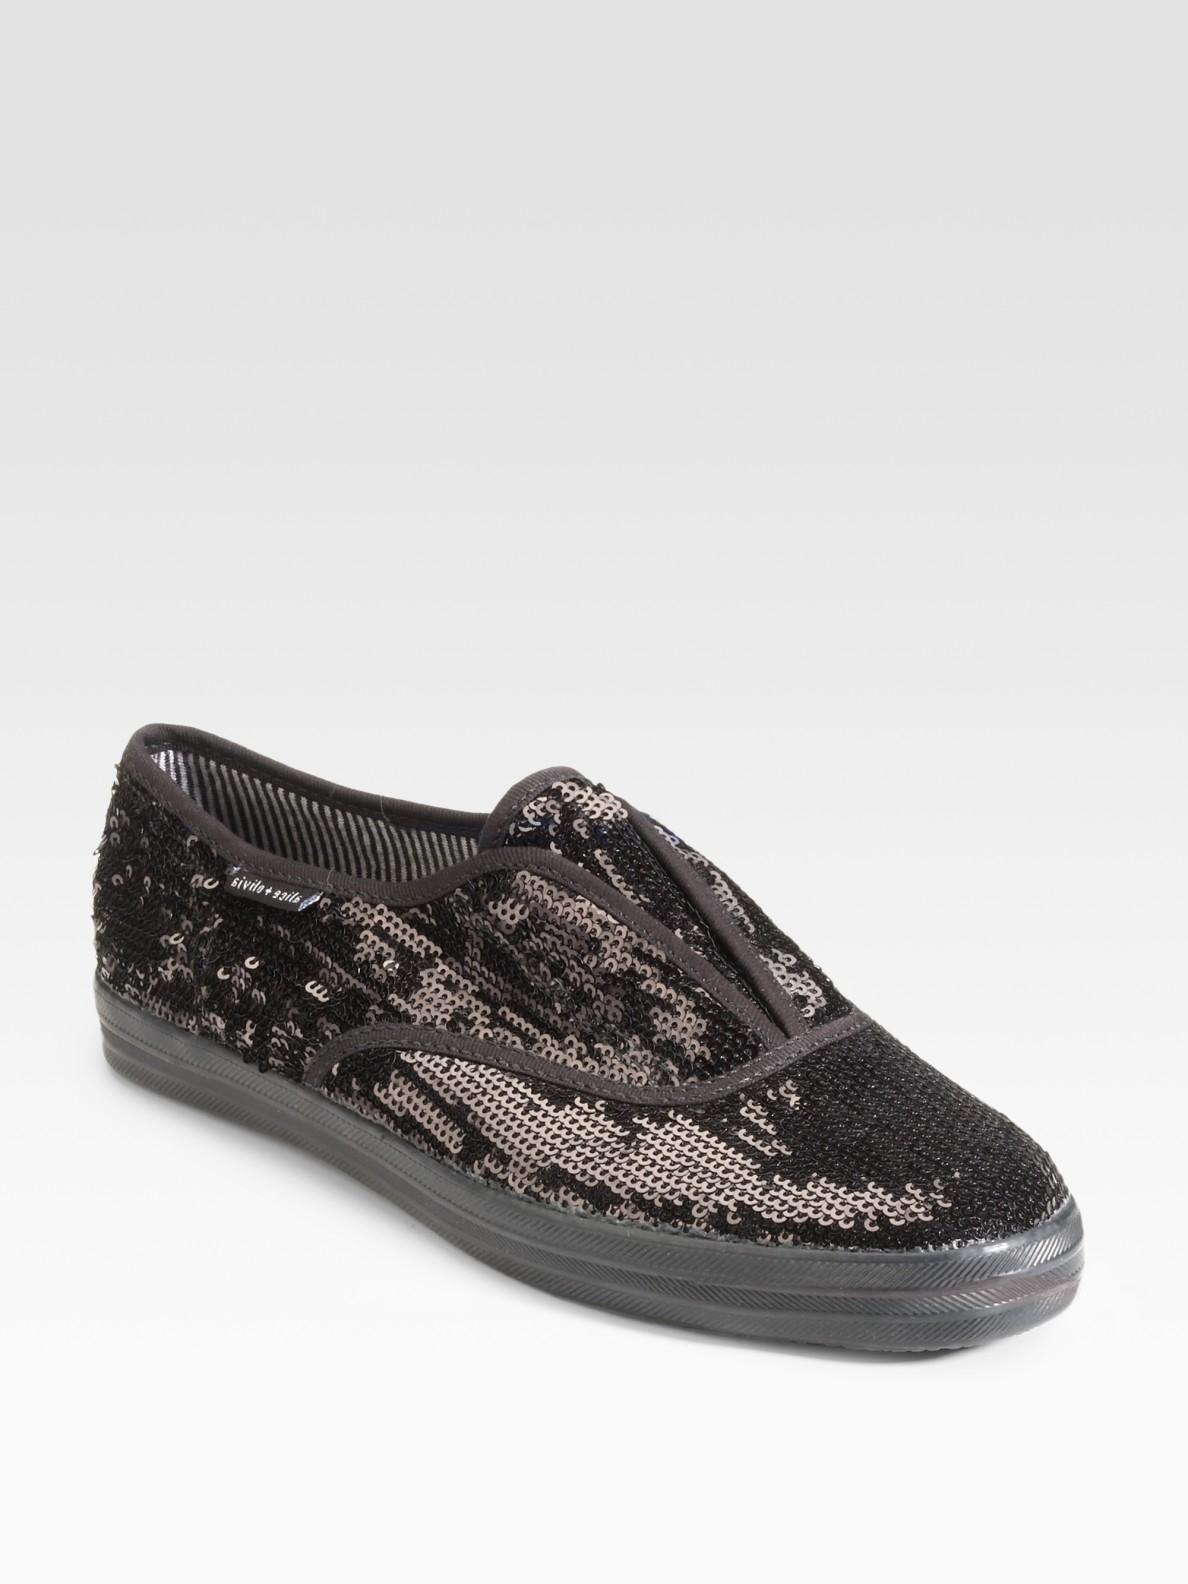 sequin keds sneakers in black lyst